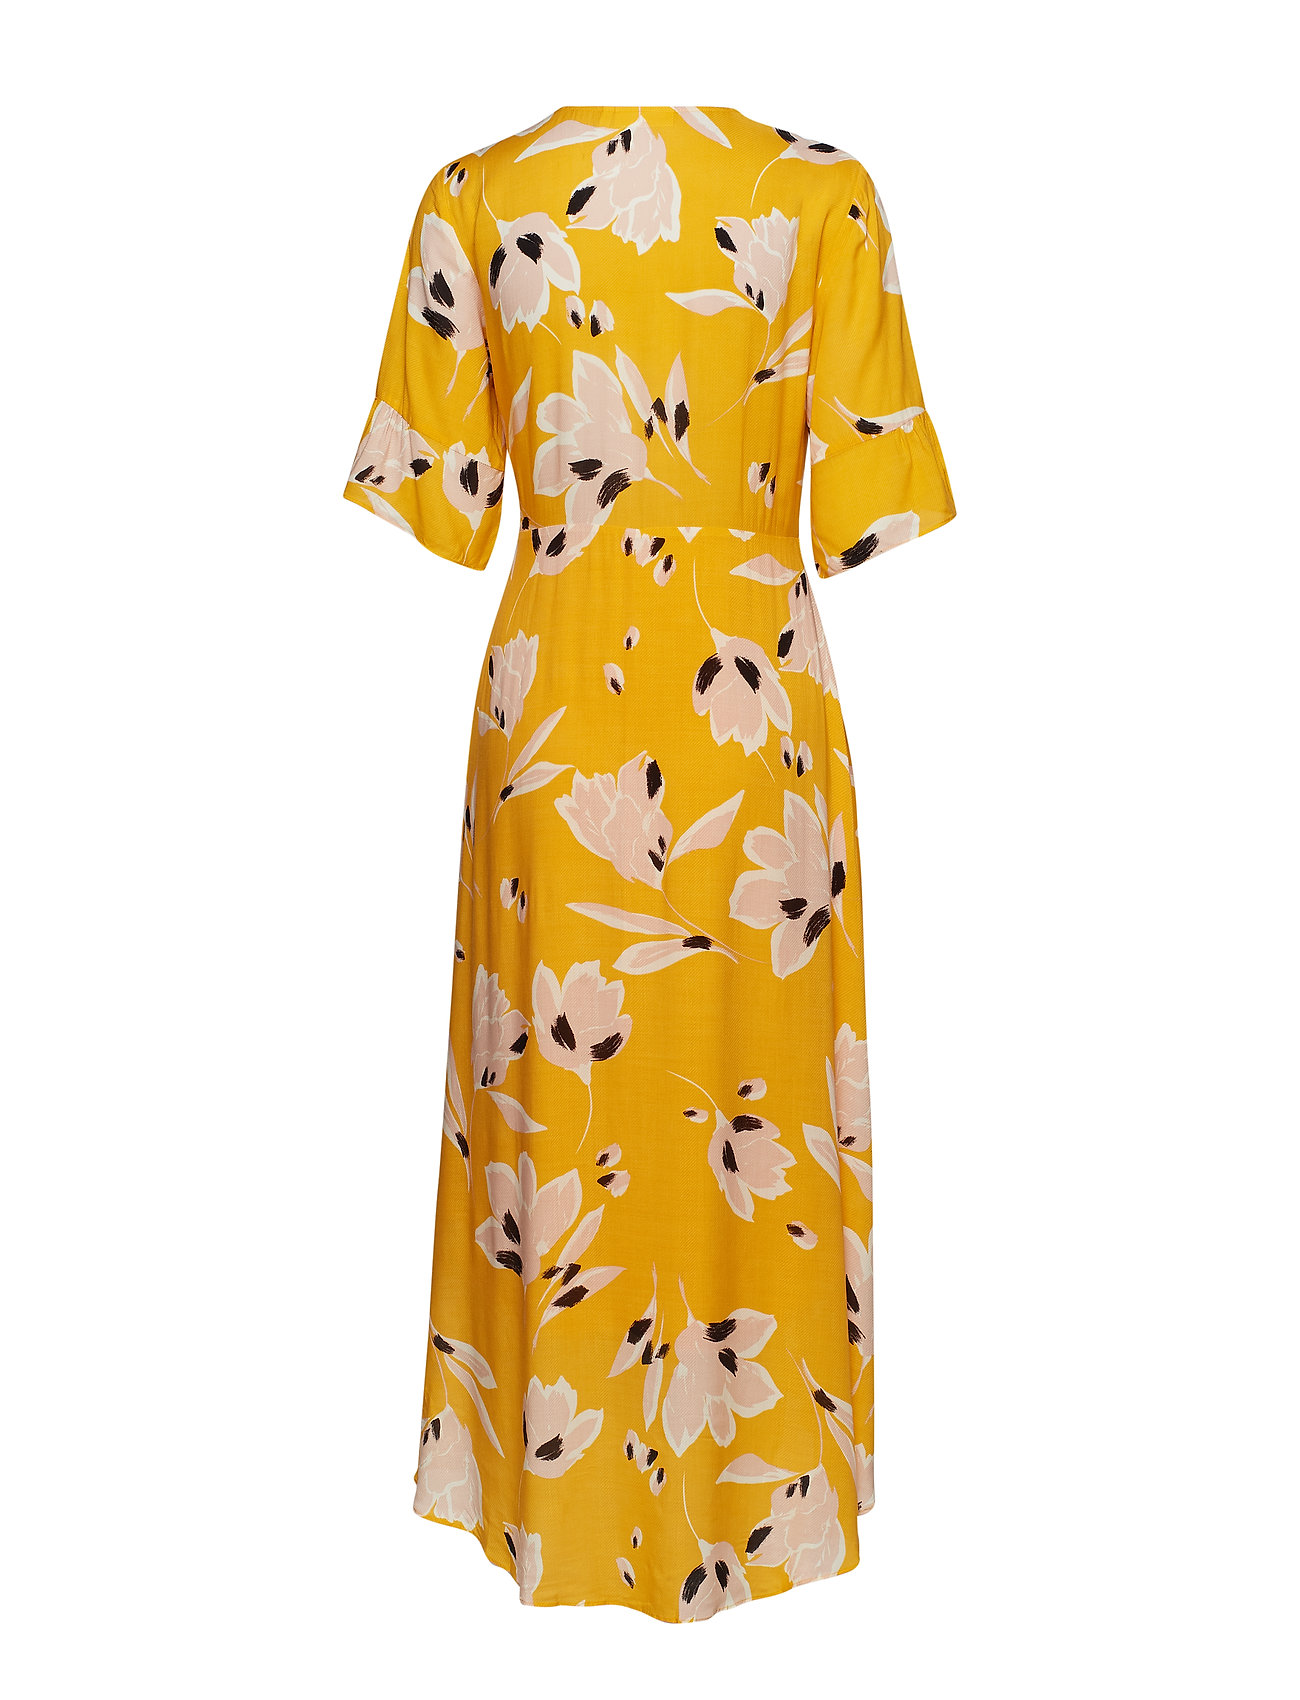 Roisin Dress Lw (Sunny Yellow Lilly Medium) (78 €) - InWear Fb6eO